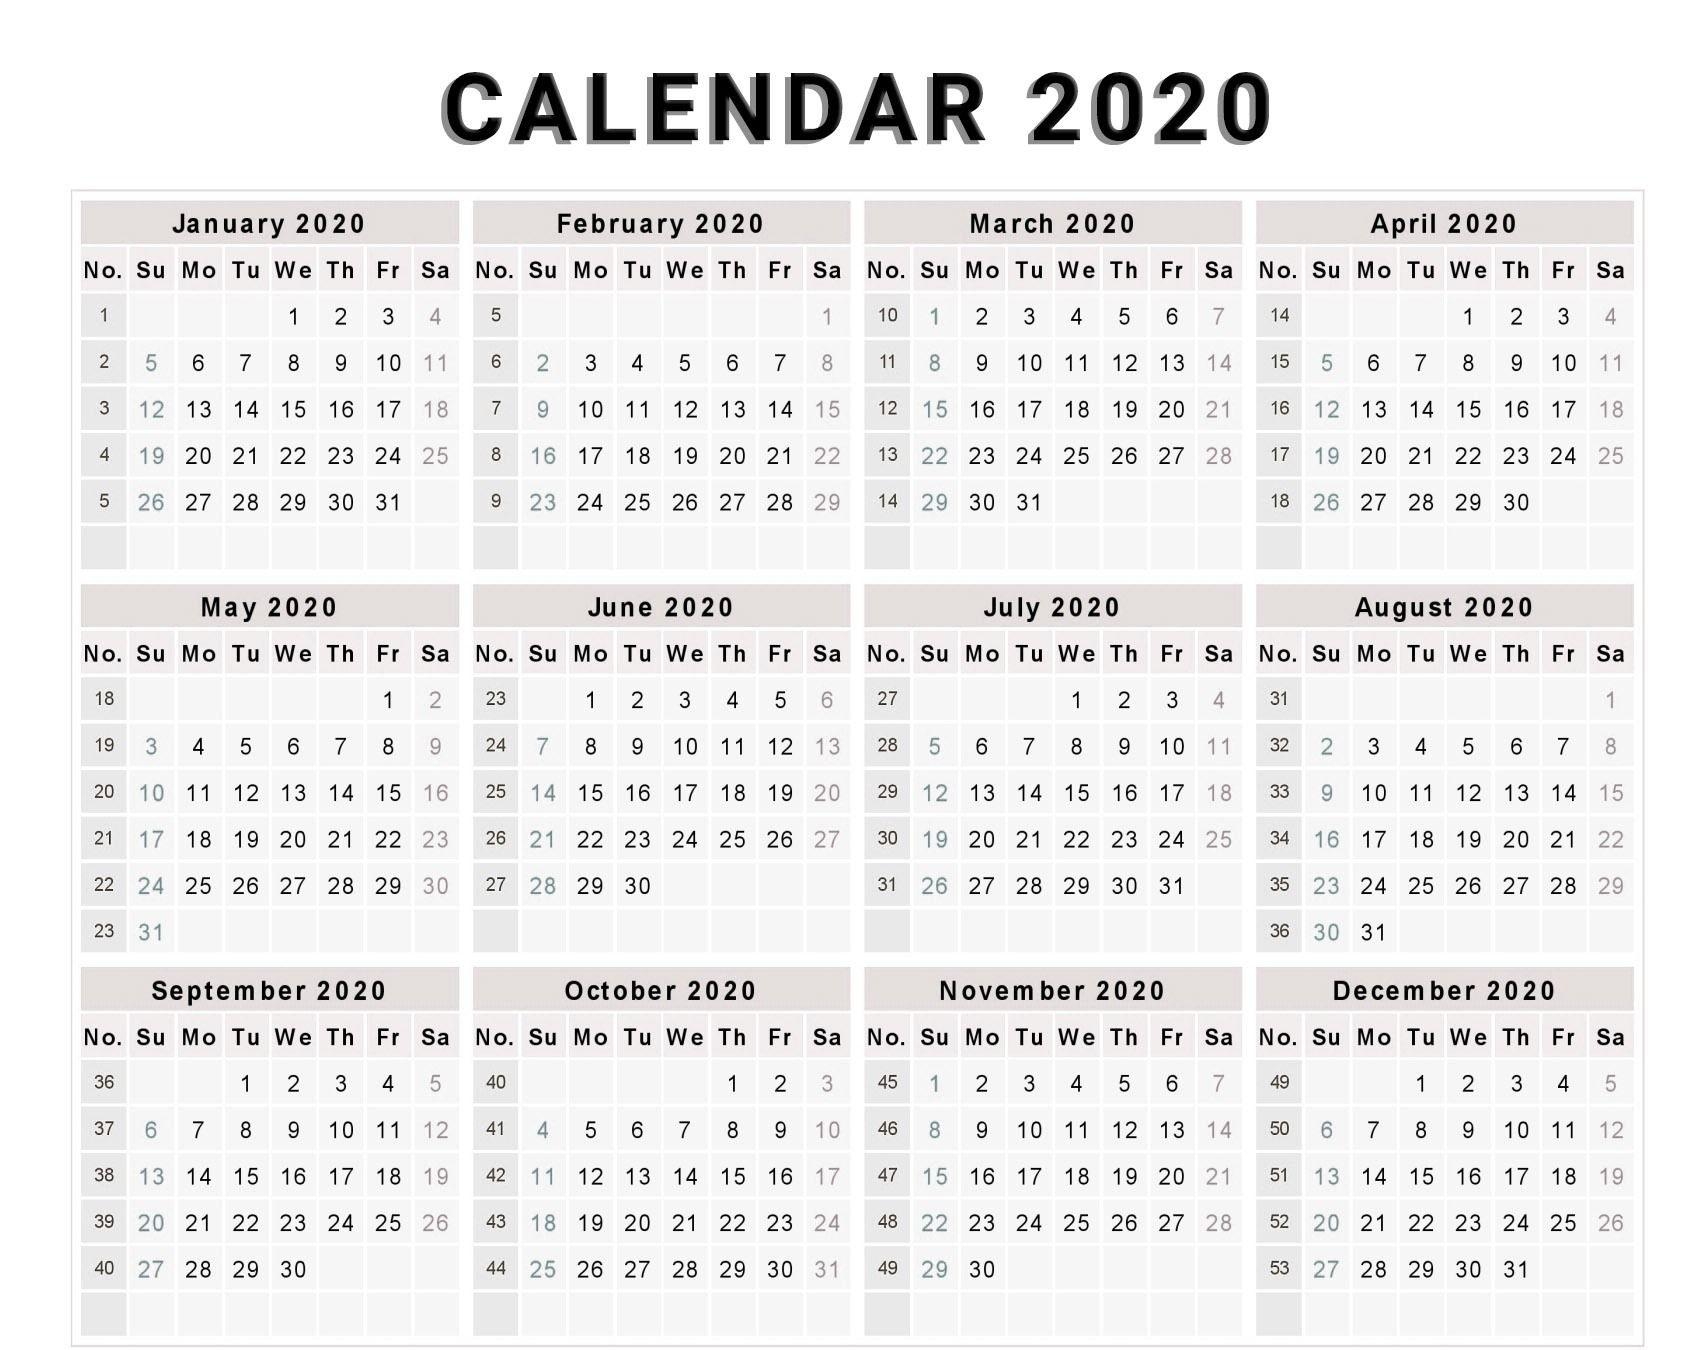 Calendar 2020 Free Template With Weeks | Free Calendar Dashing 2020 Calendar Numbered Weeks